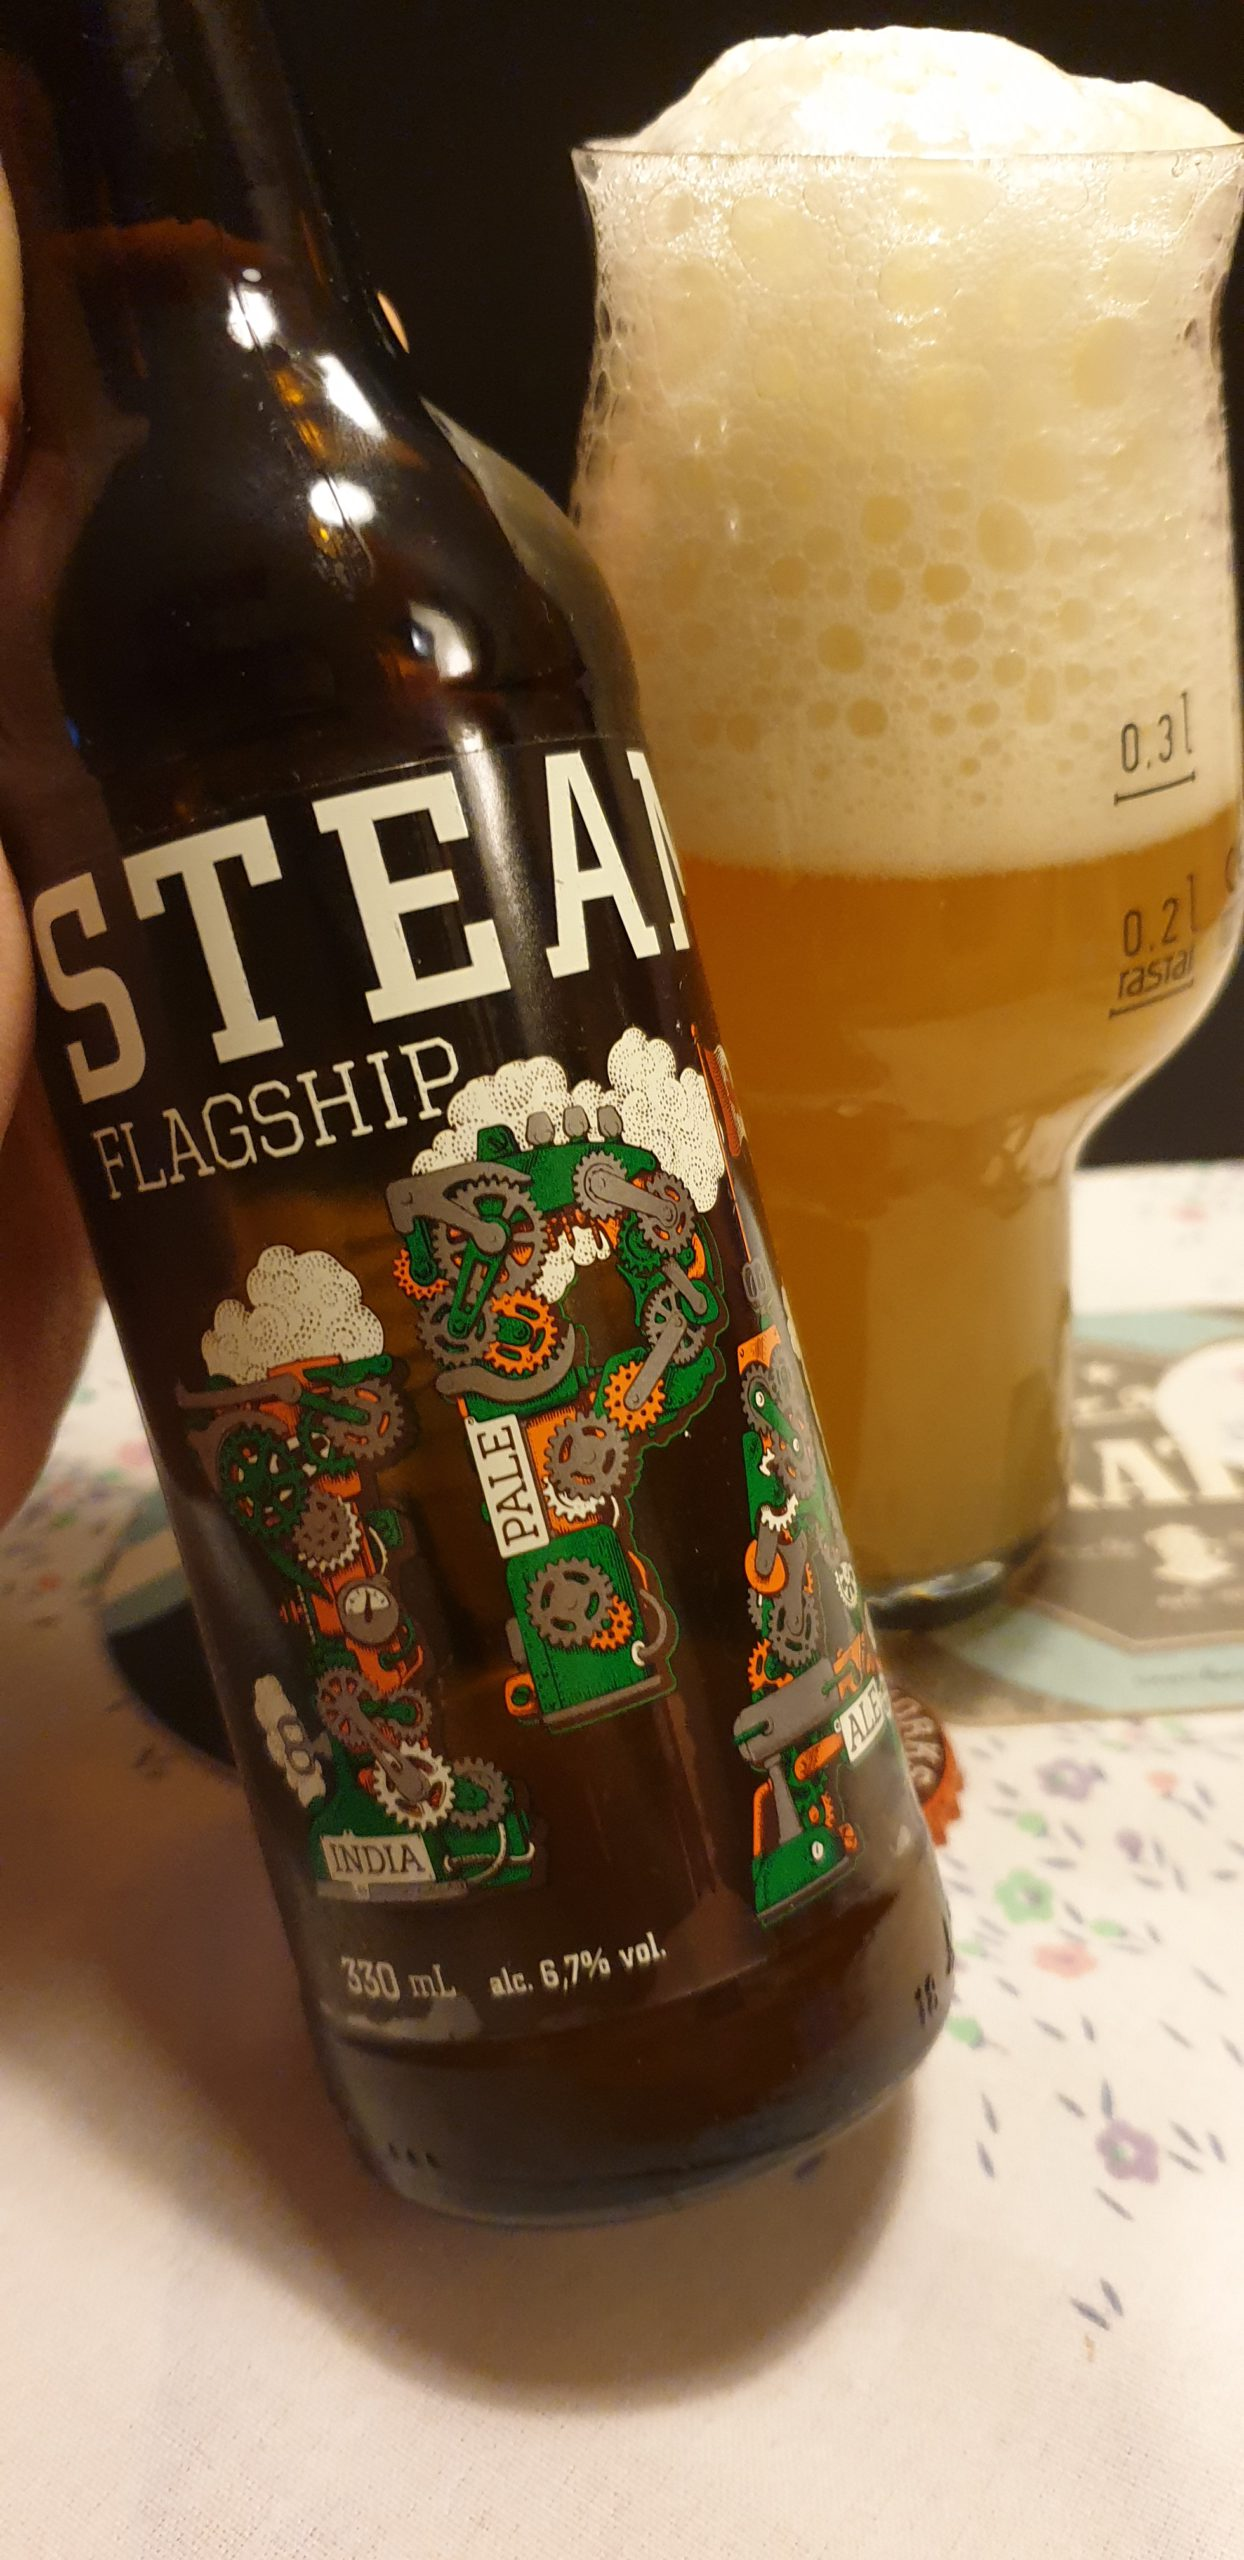 Steamworks – Flagship IPA